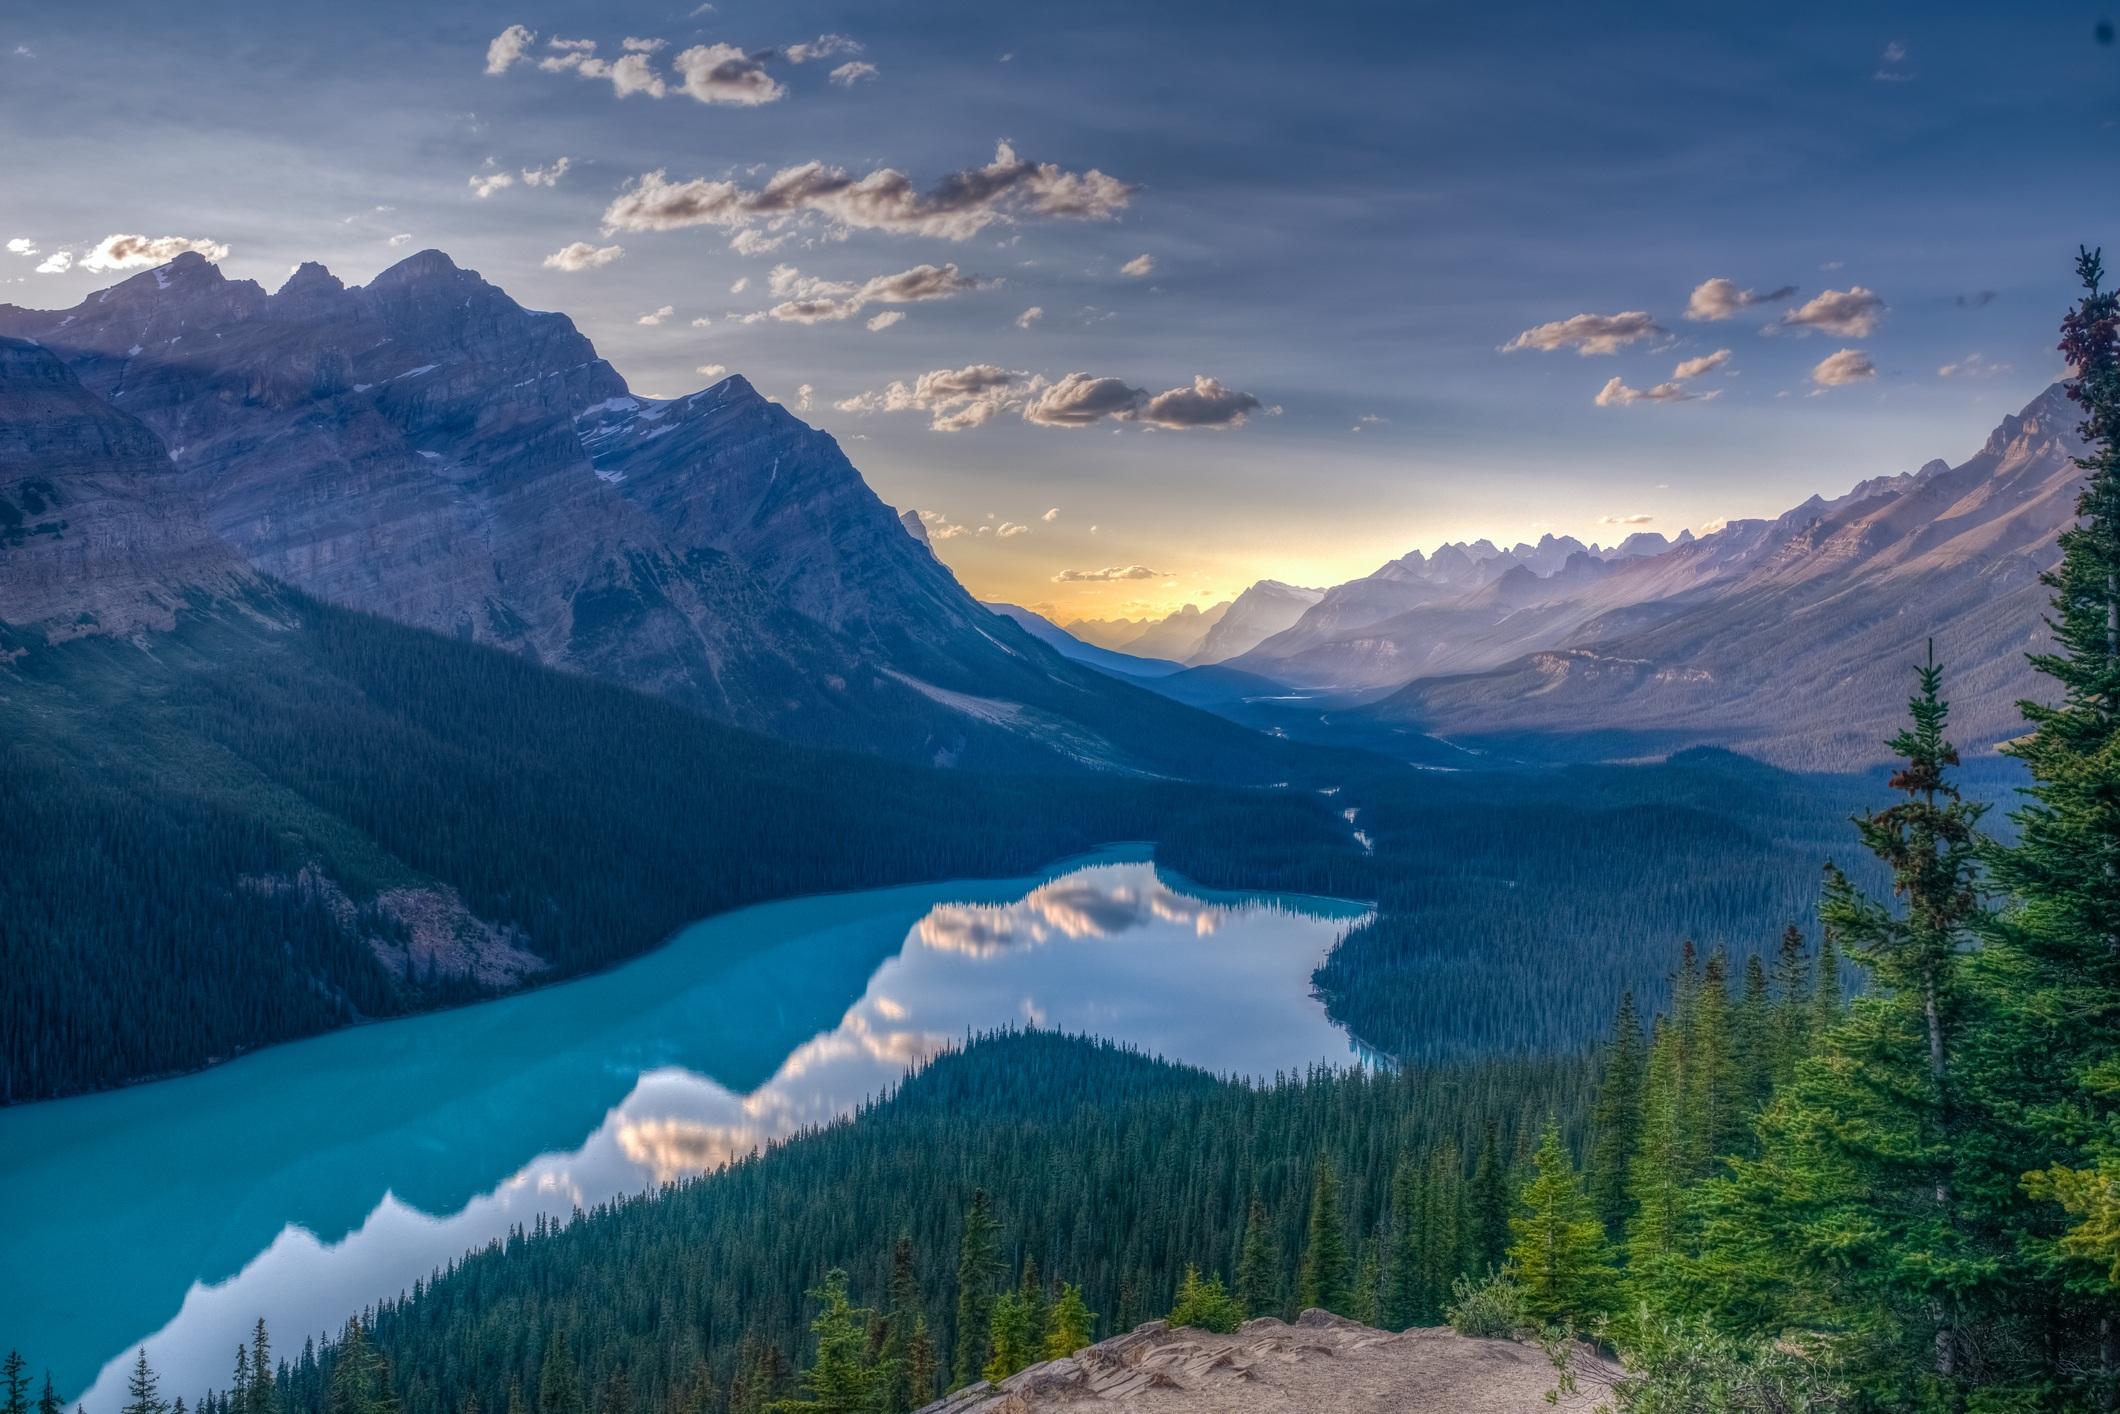 View of Peyto Lake, Jasper National Park, Canadian Rockies